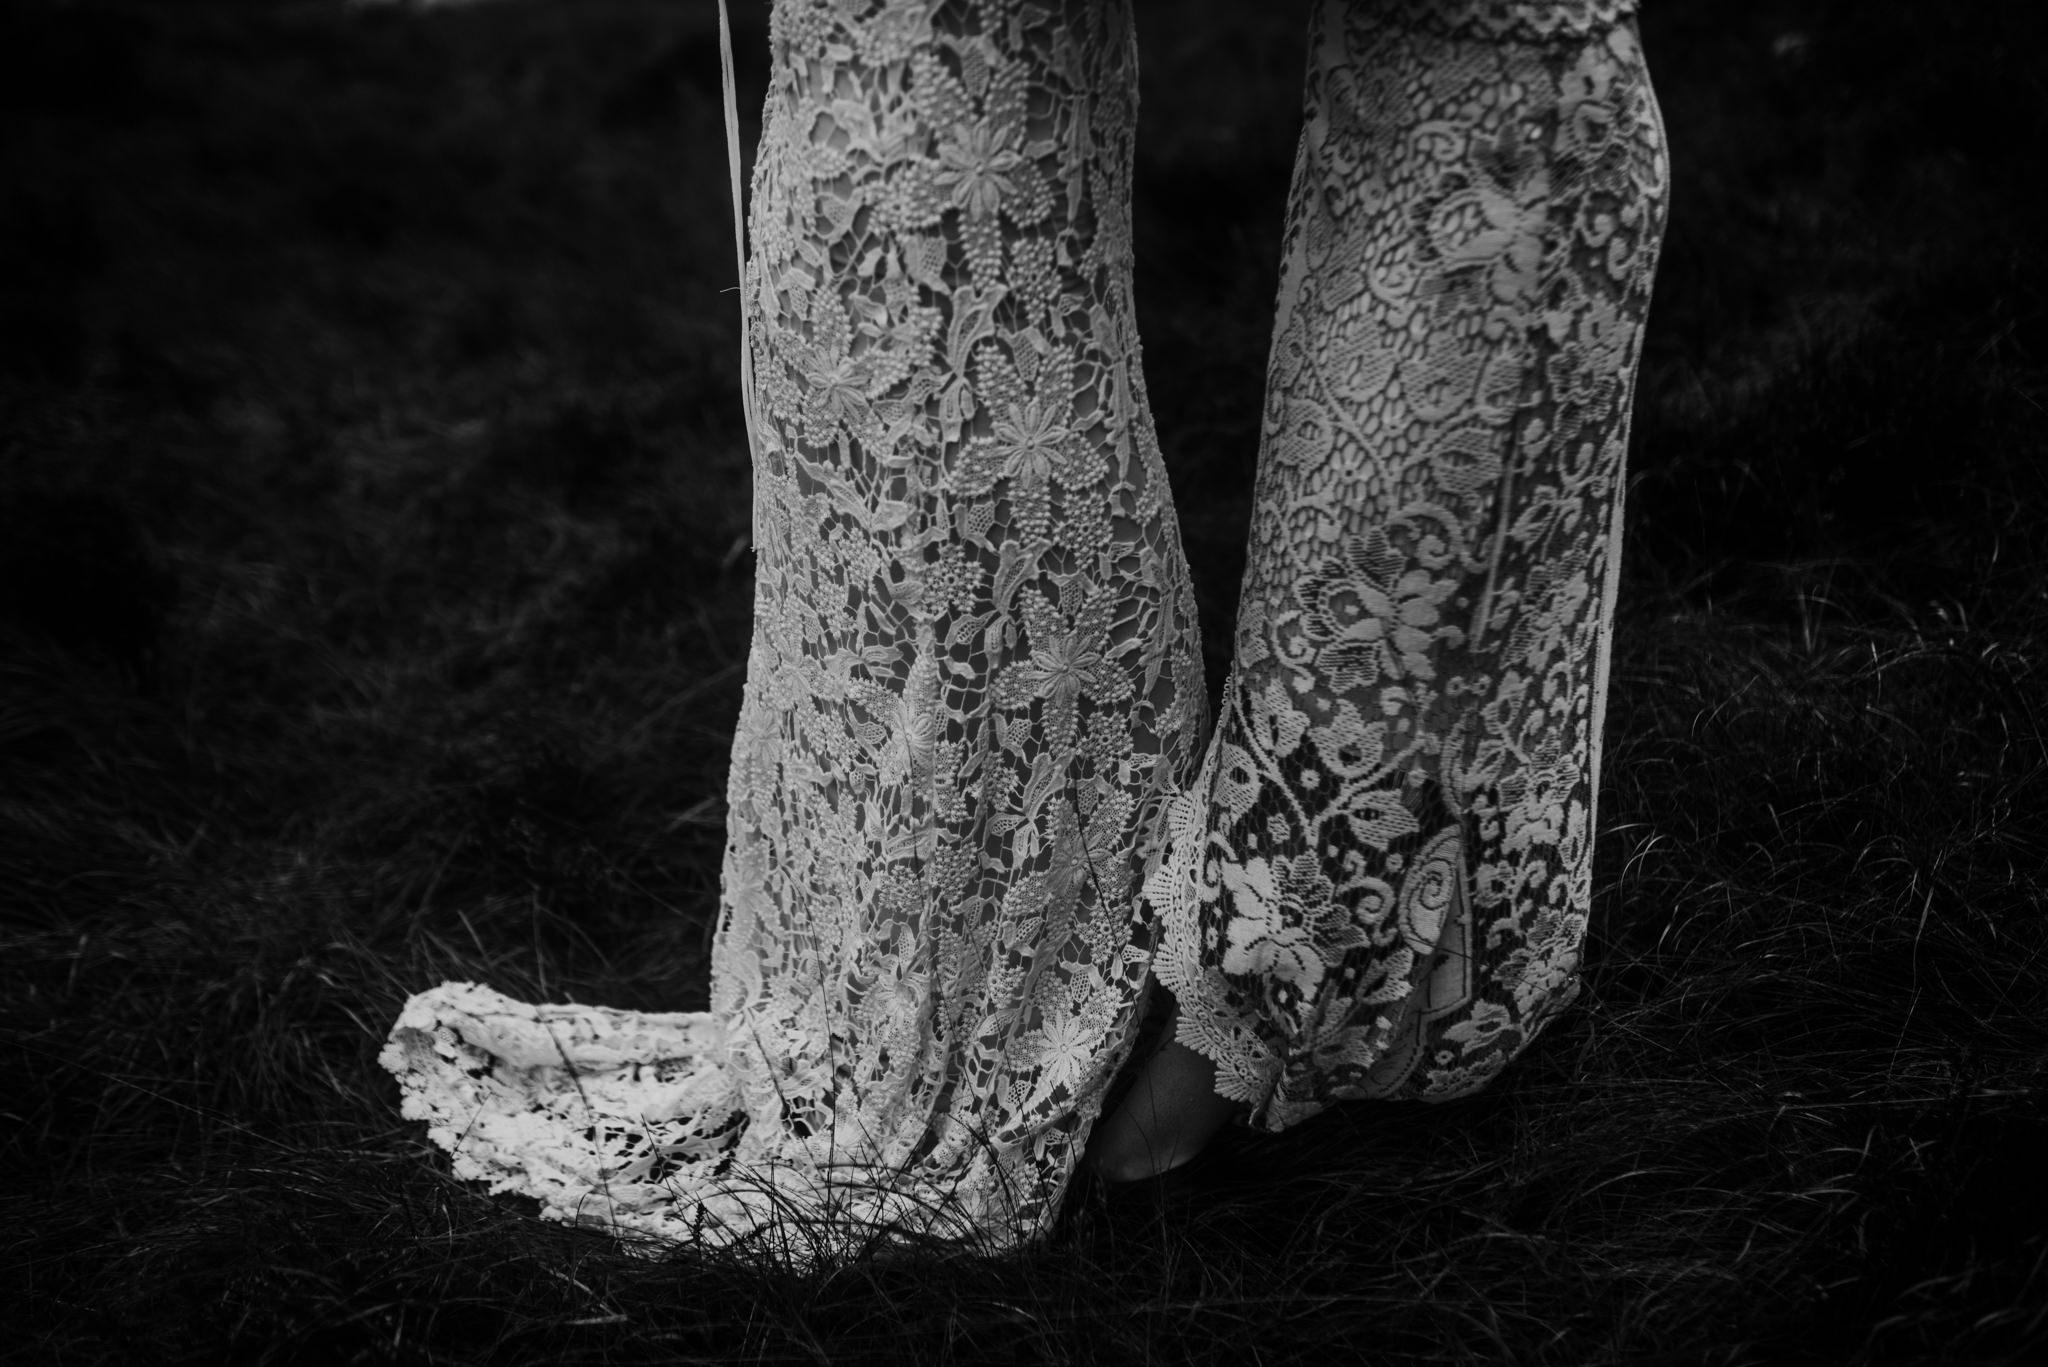 twyla jones photography - scotland glencoe moody same sex elopement brides -4.jpg